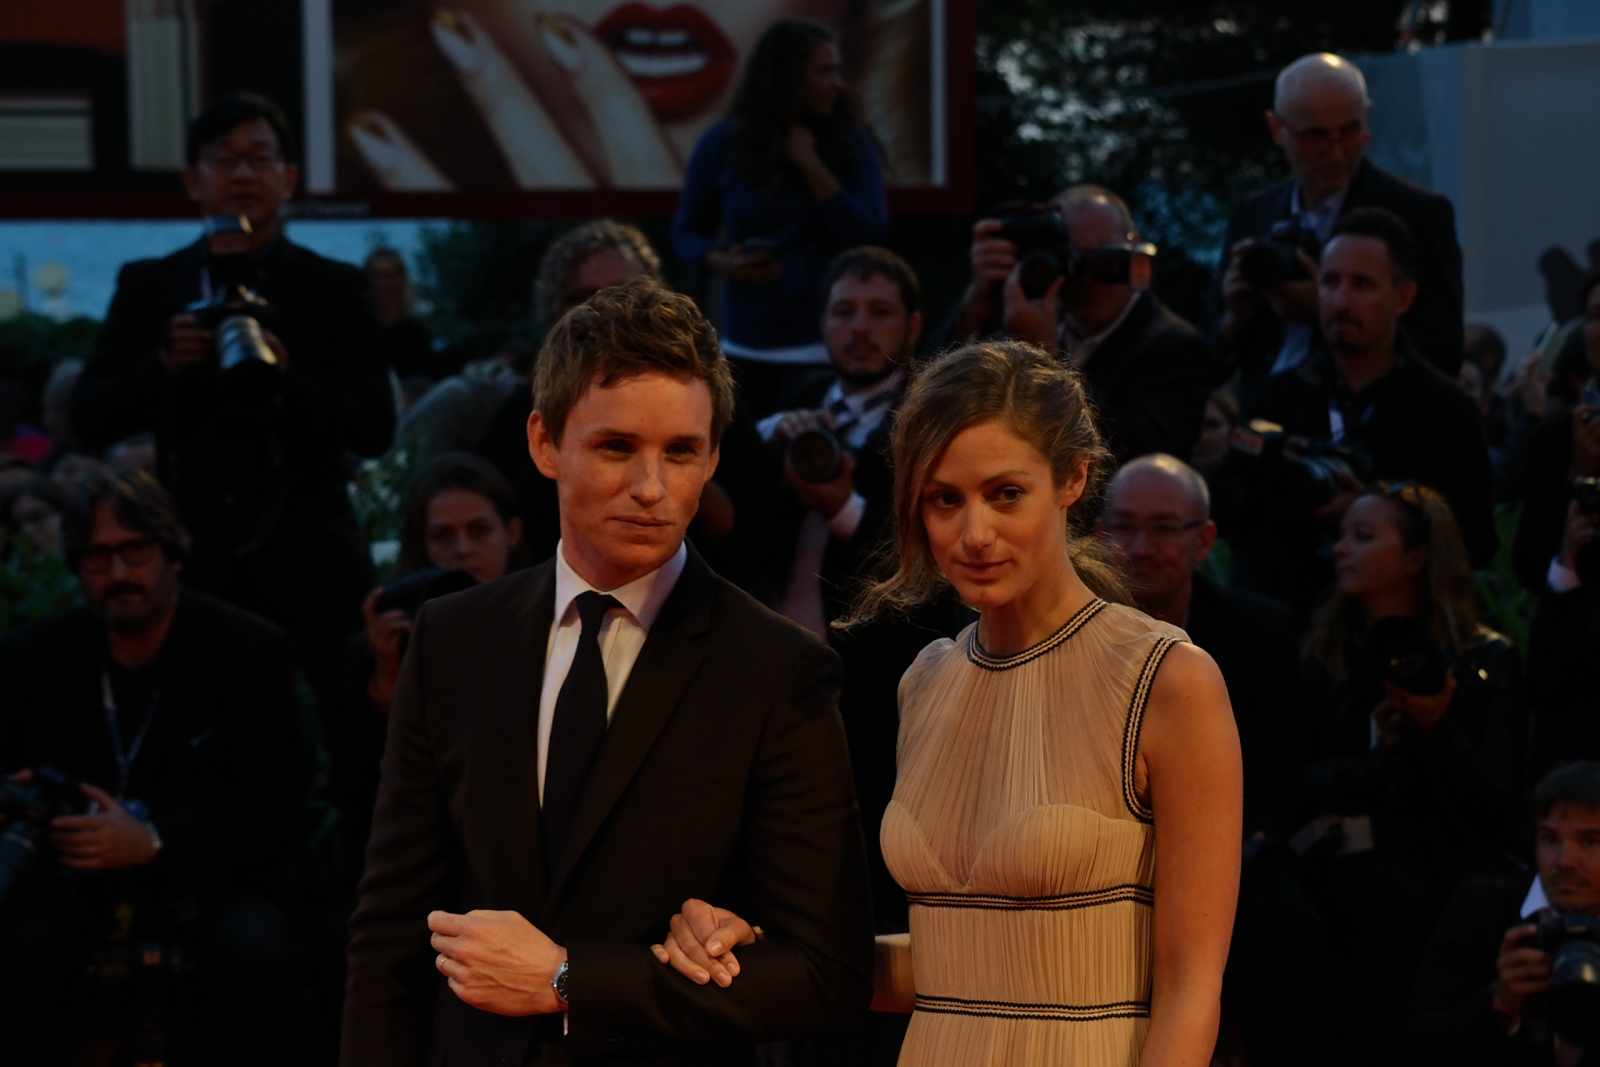 Venezia 2015: Eddie Redmayne e sua moglie sul red carpet di The Danish Girl